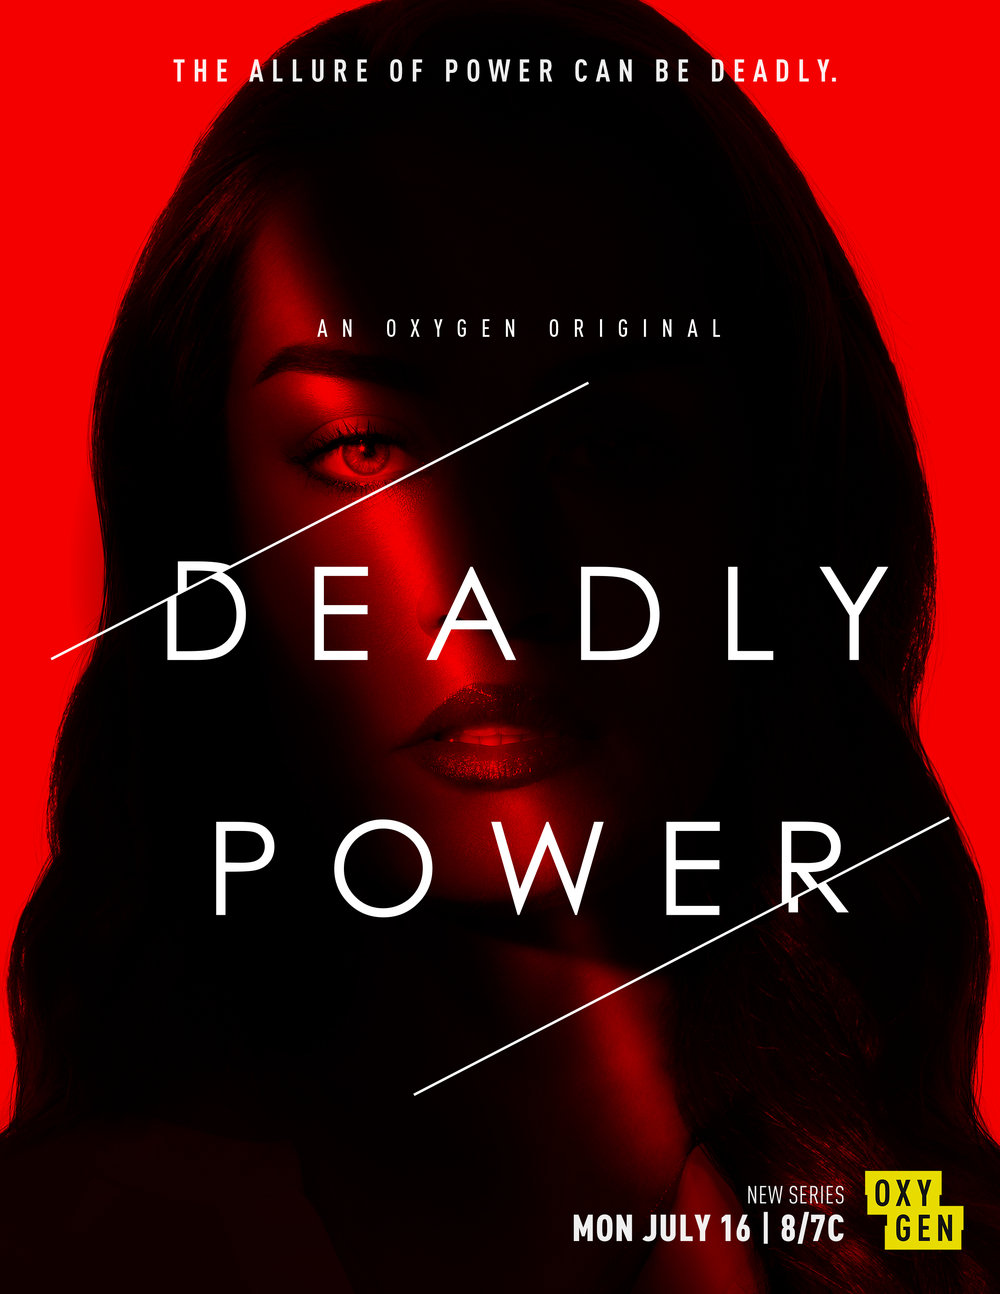 Deadly_Power_KeyArt8.5x11_300dpi_Lara.jpg